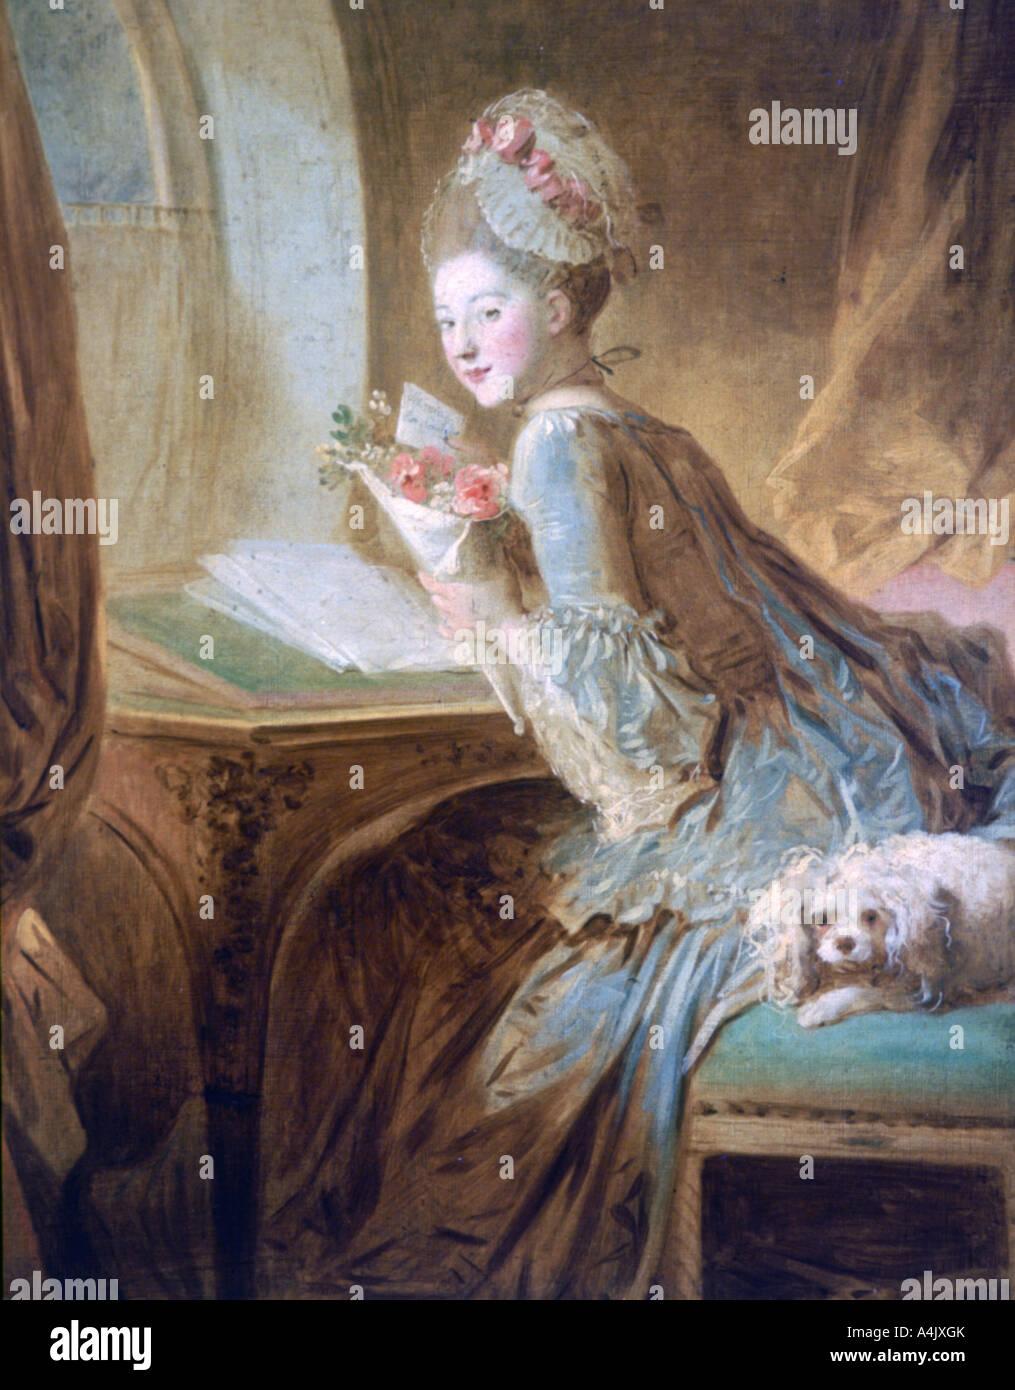 """La Carta de amor', C1770. Artista: Jean-Honore Fragonard Imagen De Stock"